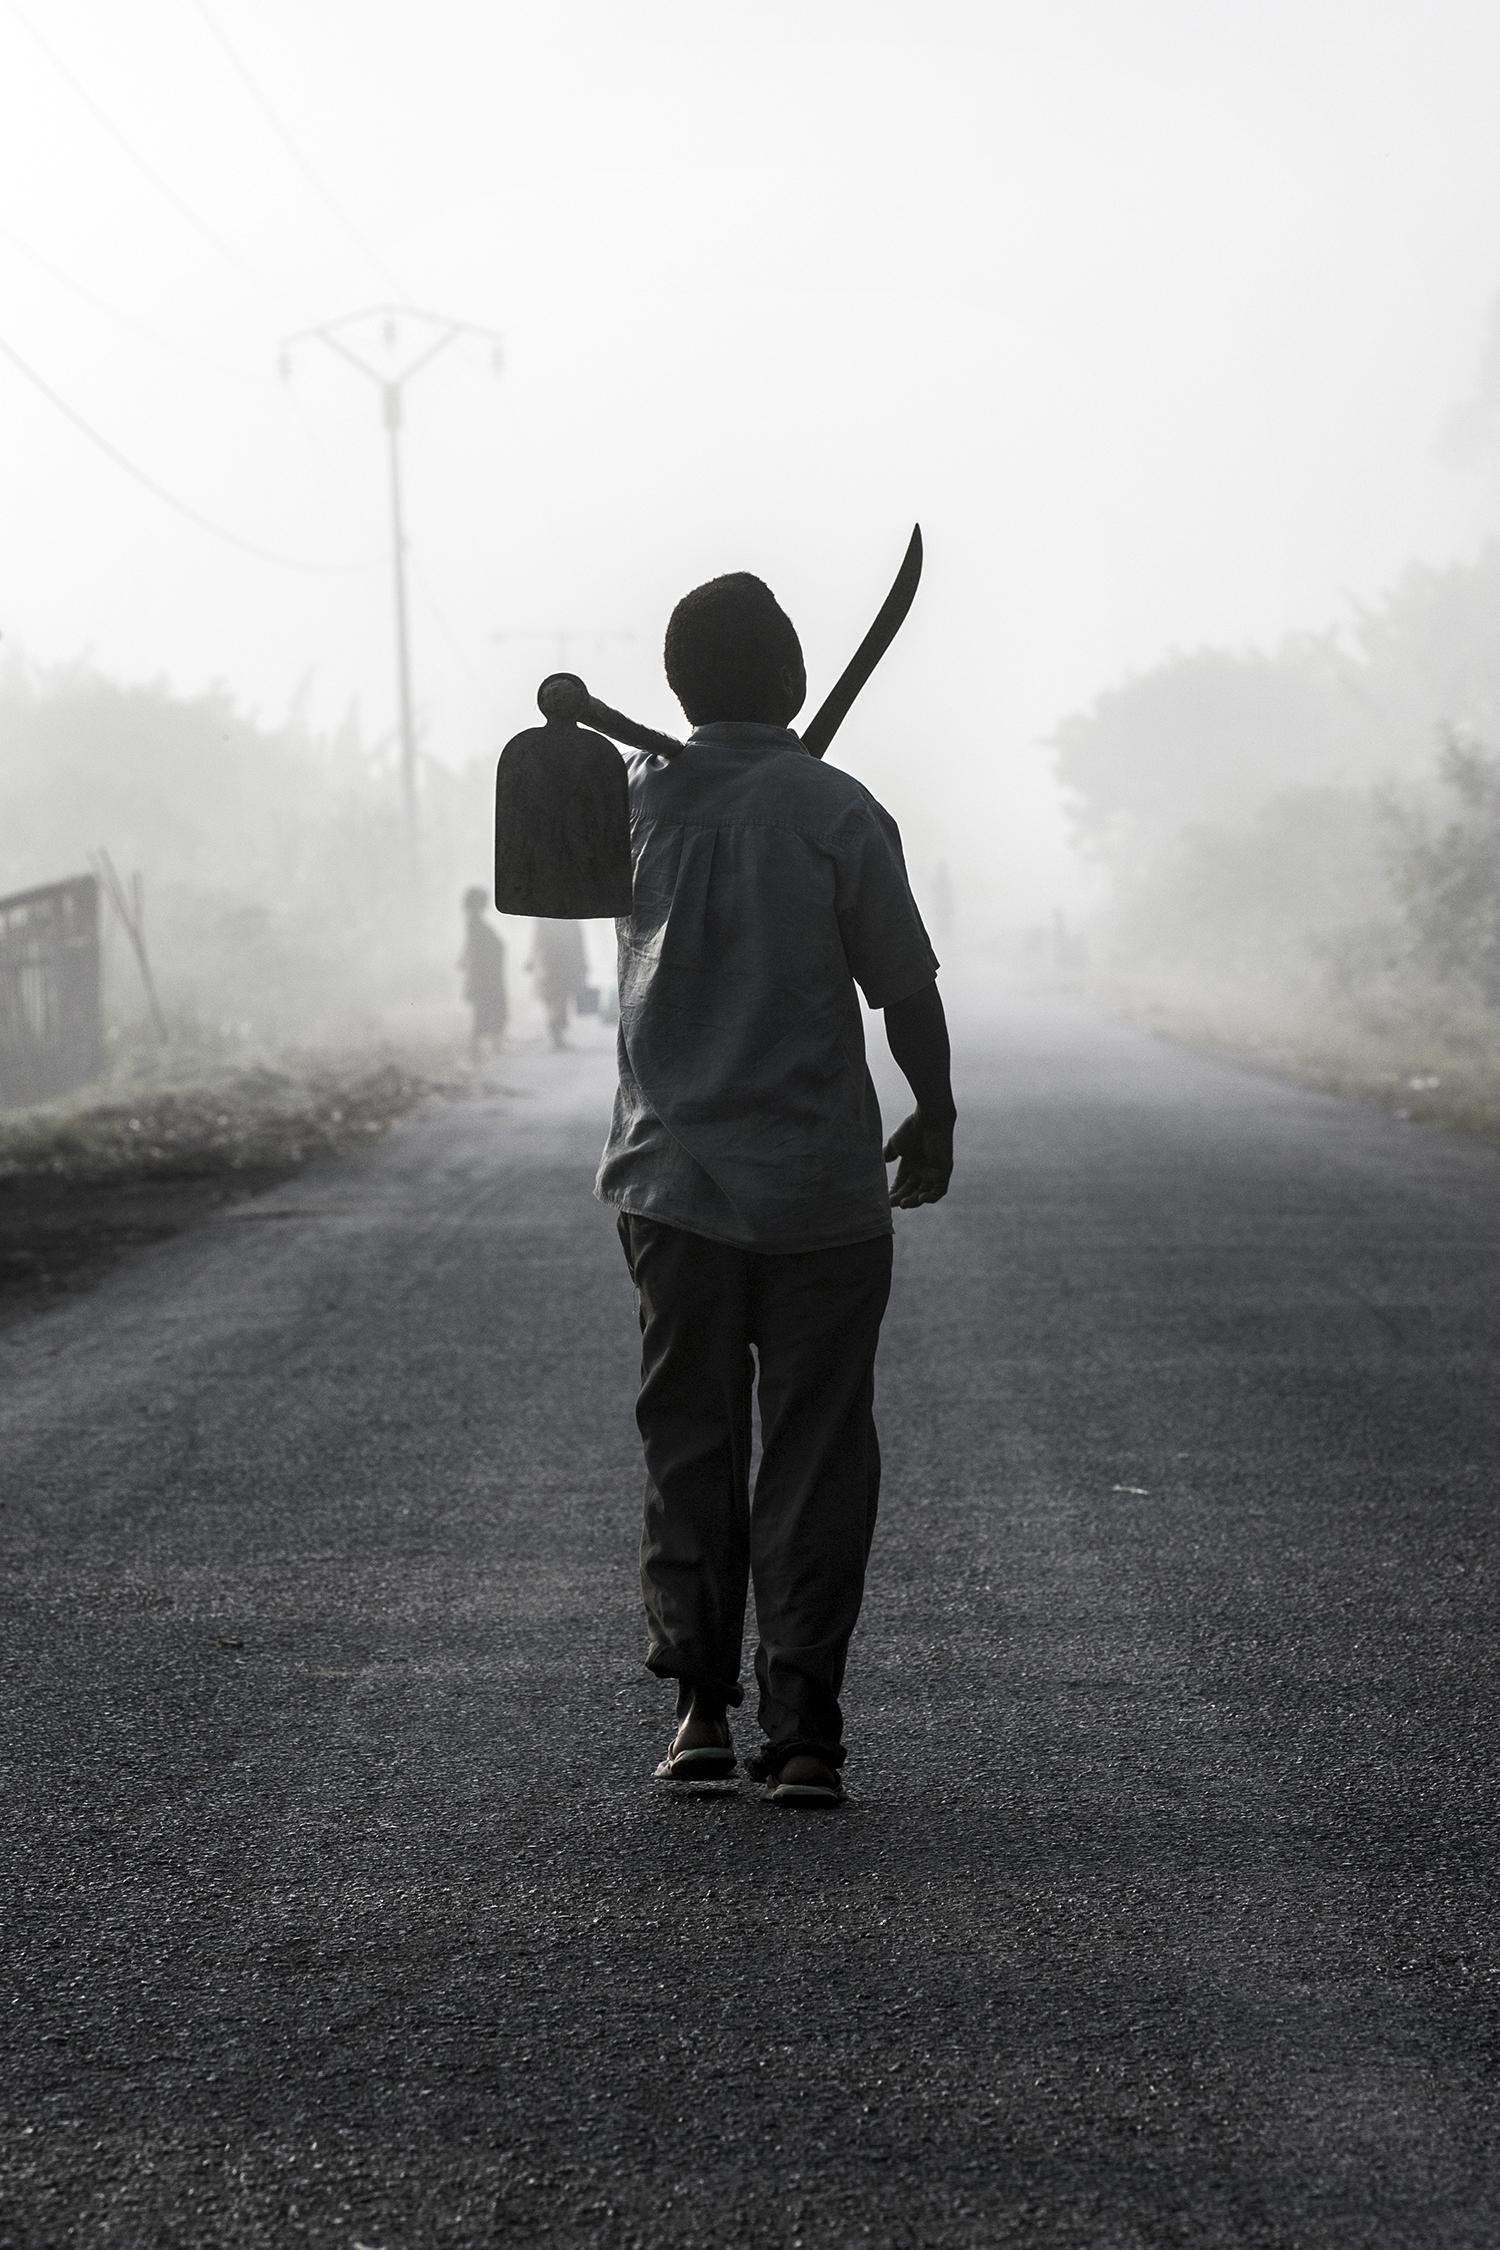 201606_Oxfam_Novib_Peace_Beyond_Borders_Burundi_Rwanda_Congo_DRC_Jeppe_Schilder_25.jpg